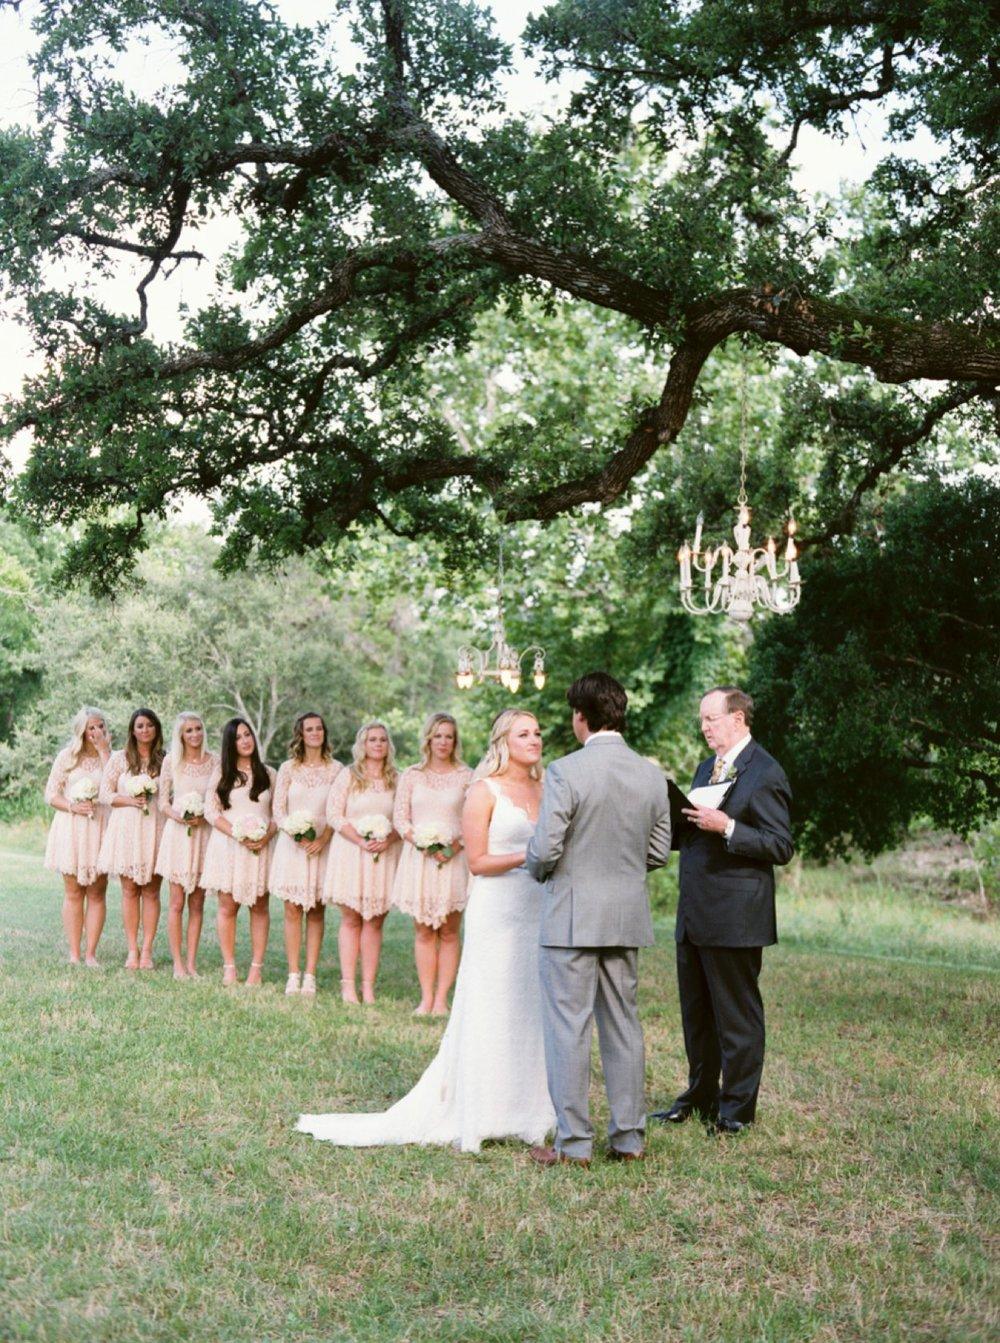 de2c9-http3a2f2fjennamcelroy-com2fblog2f20152f102f52fjennas-bridals-austin-wedding-photographer2fblog2f20152f102f52fjennas-bridals-austin-wedding-photographer.jpg